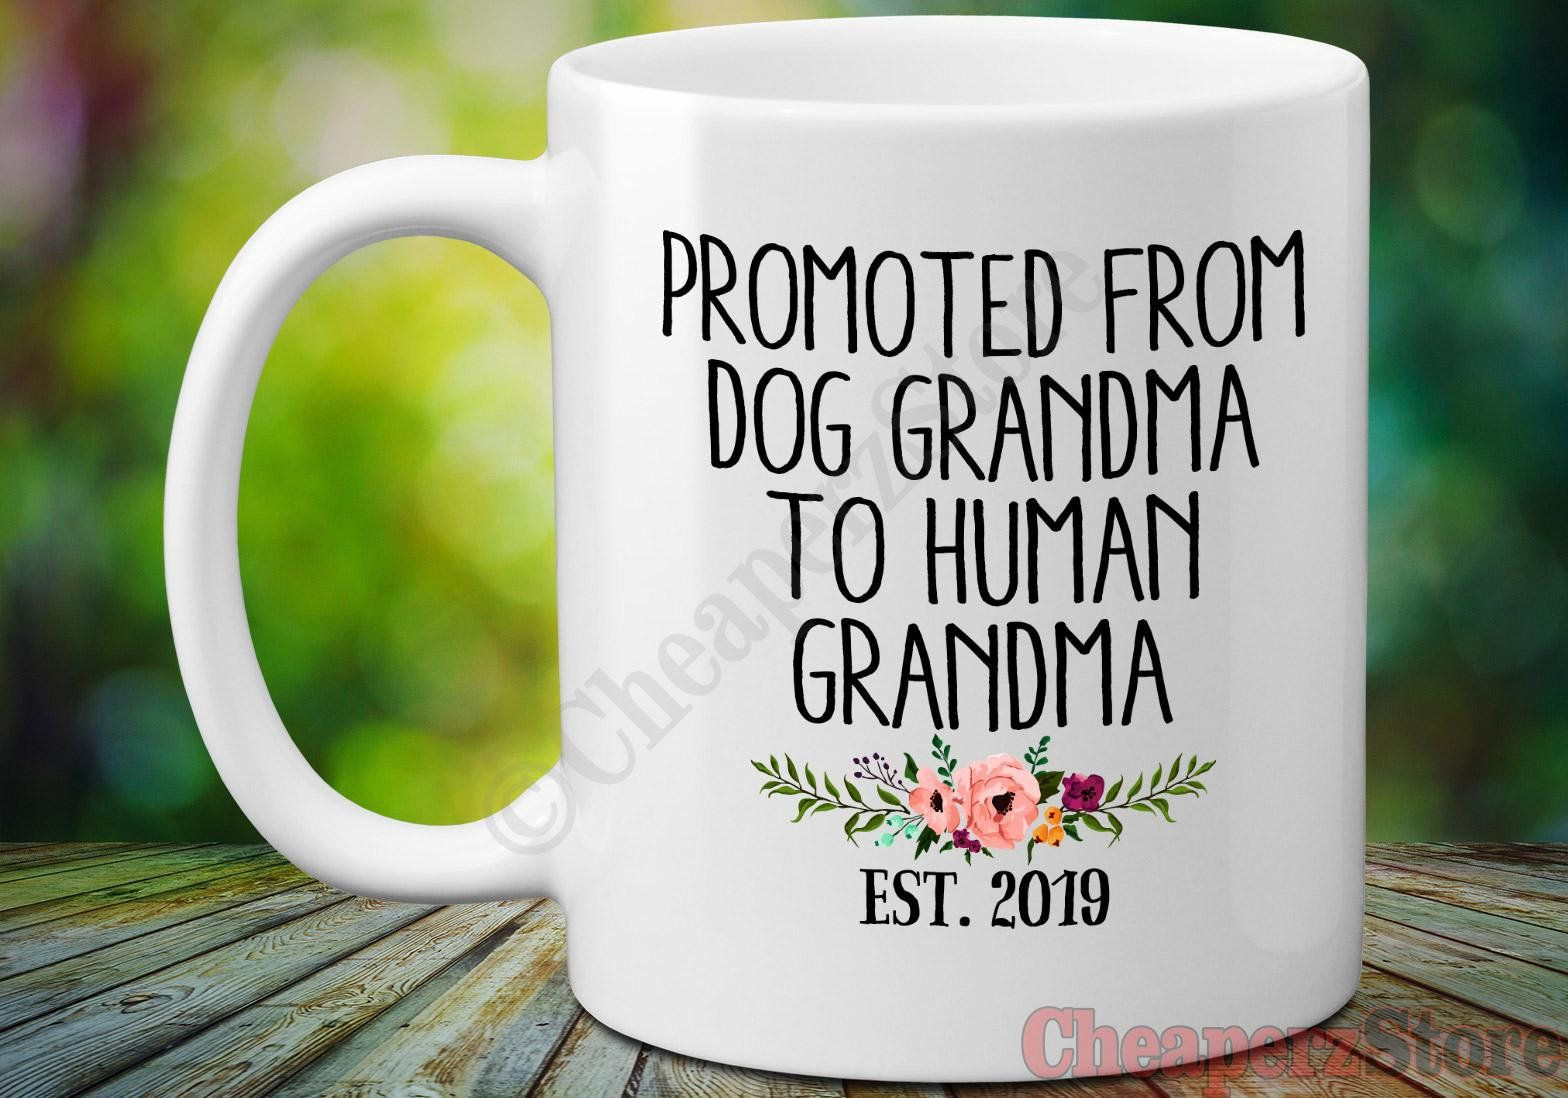 Homemade Gifts For Grandma From Baby  Baby Announcement Mug Gift for Grandma Dog Grandma to